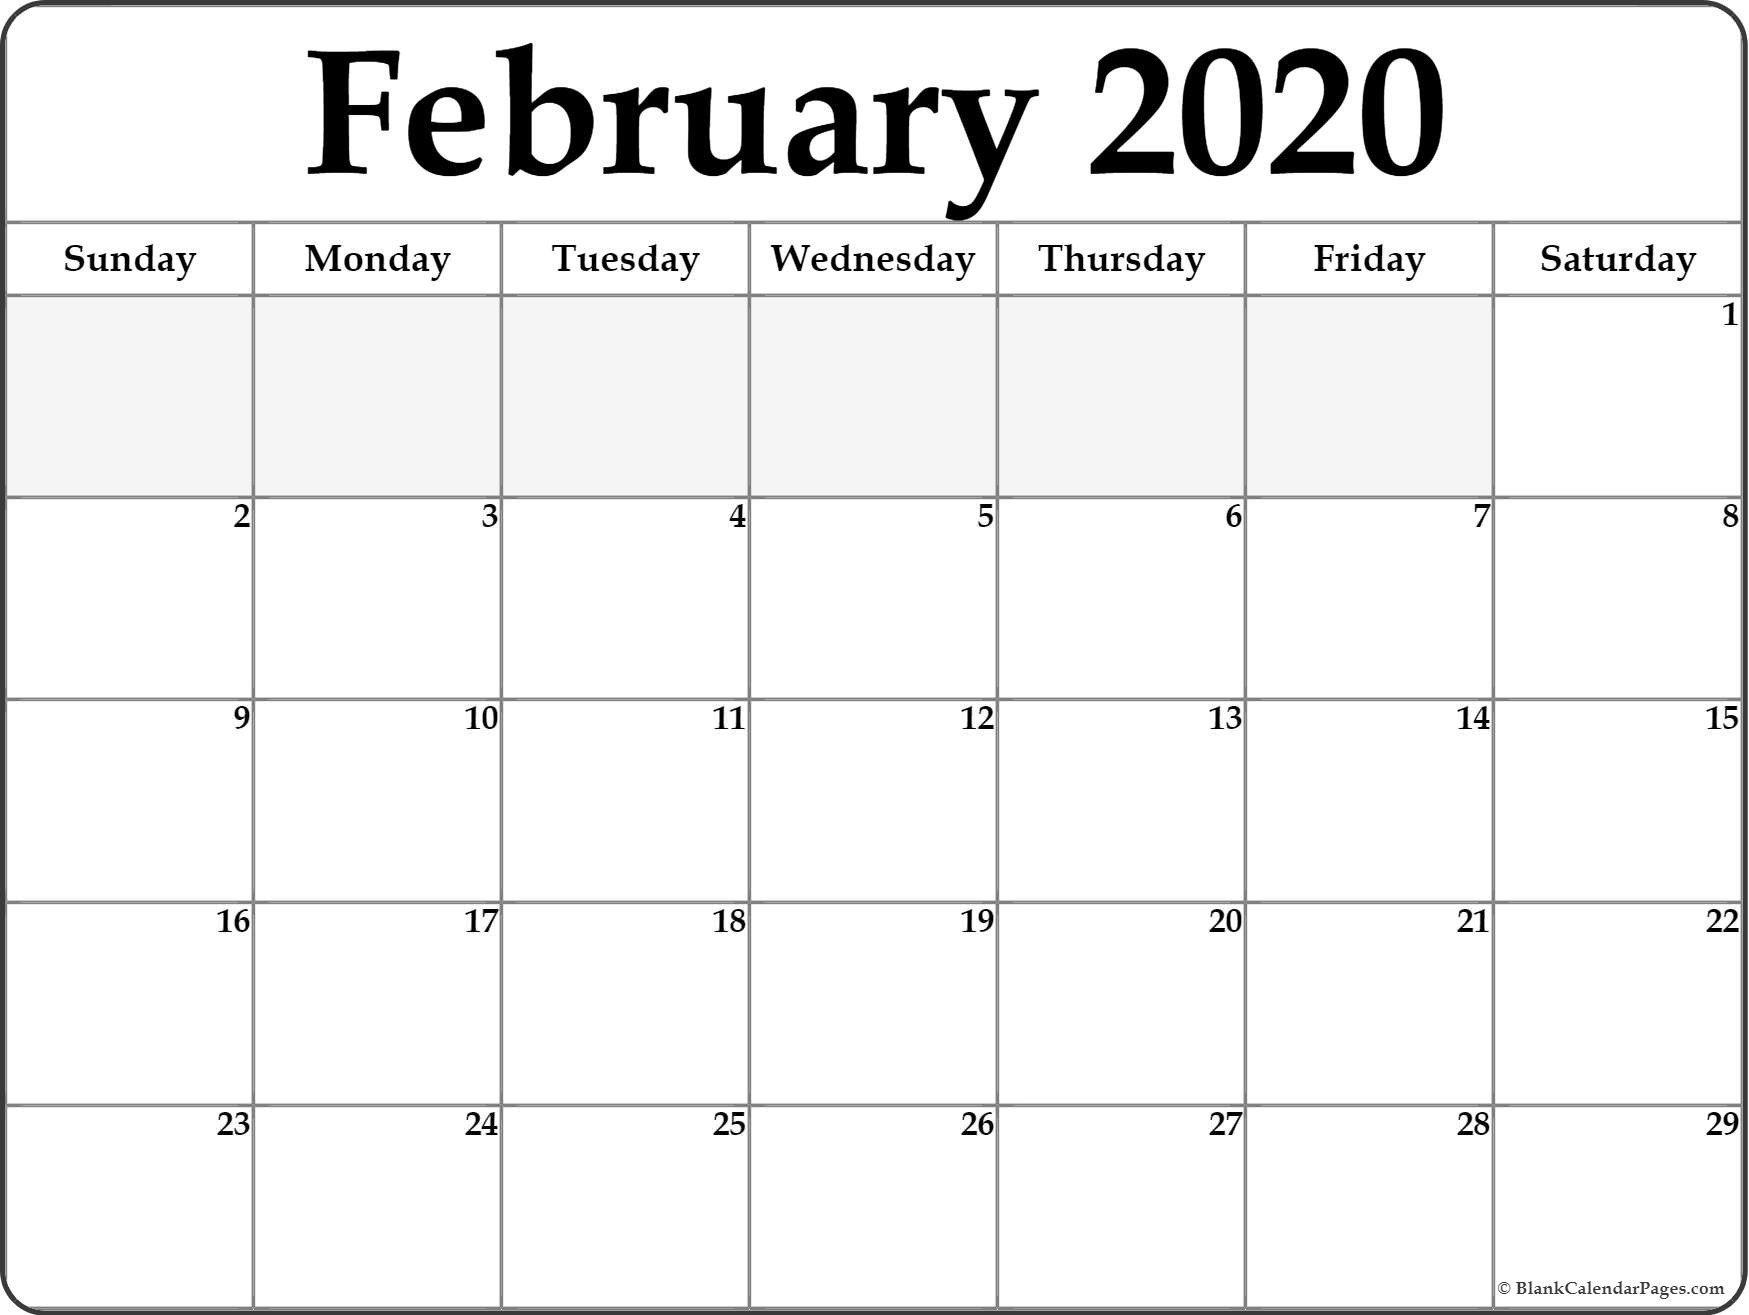 Blank Fill In Calendars 2020 Printable | Calendar Template Free Printable Fill In Calendars